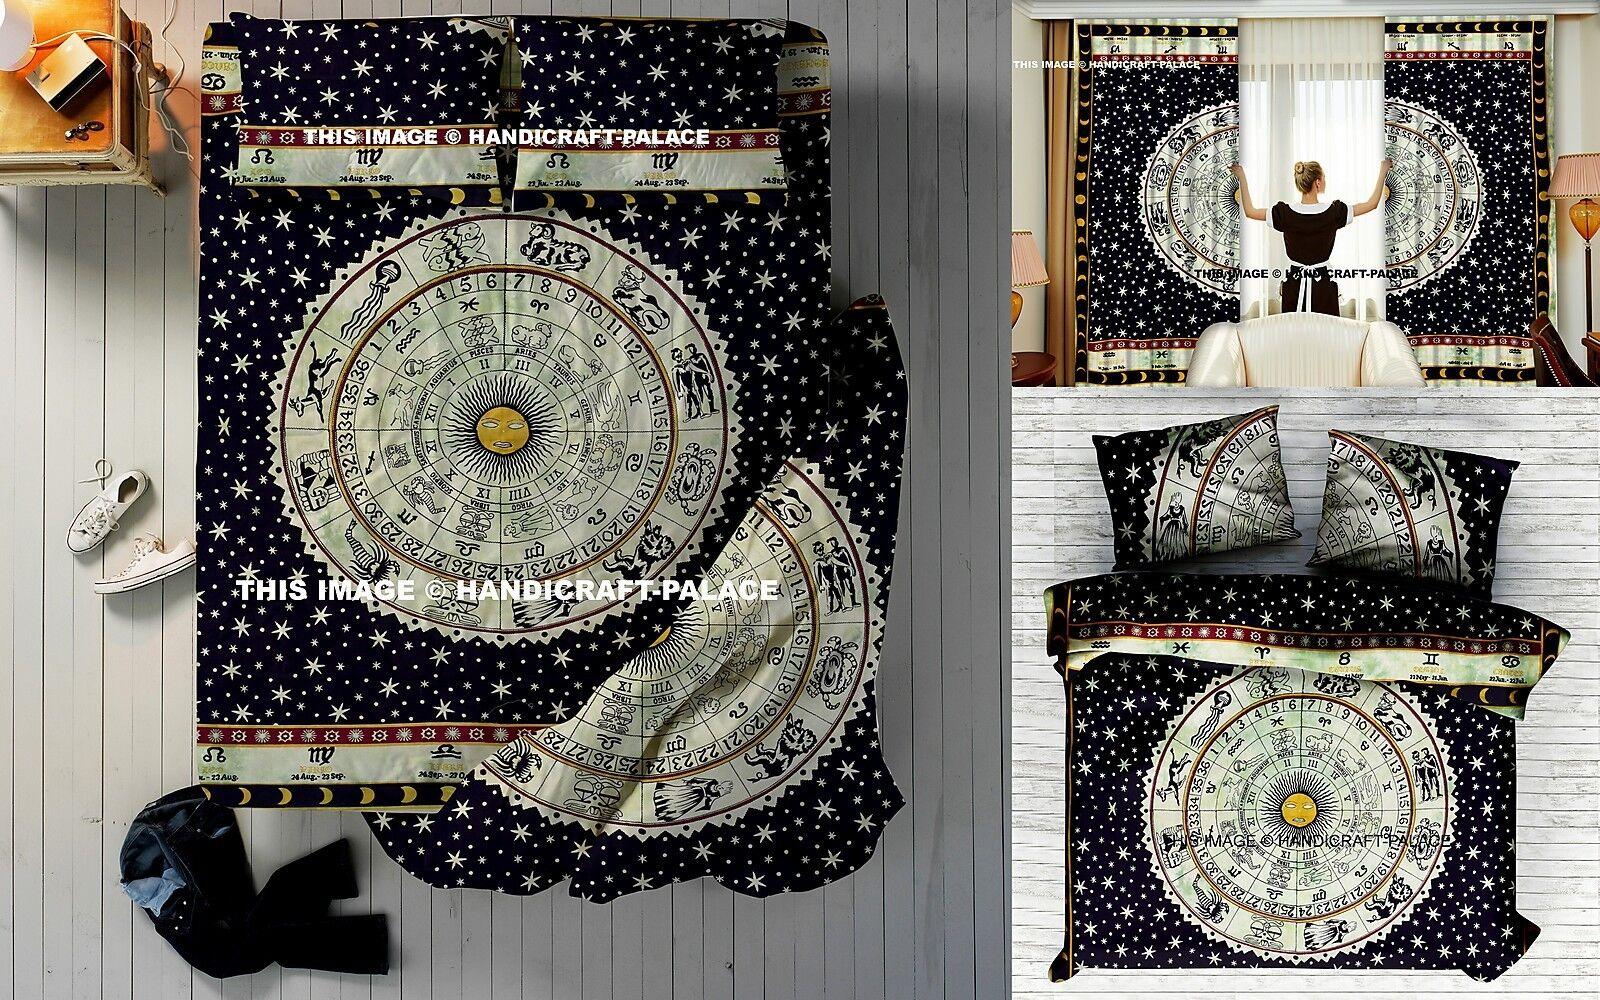 5 PCs Indian Queen Zodiac Duvet Doona Cover Set + Curtains + Bedspread + Pillows